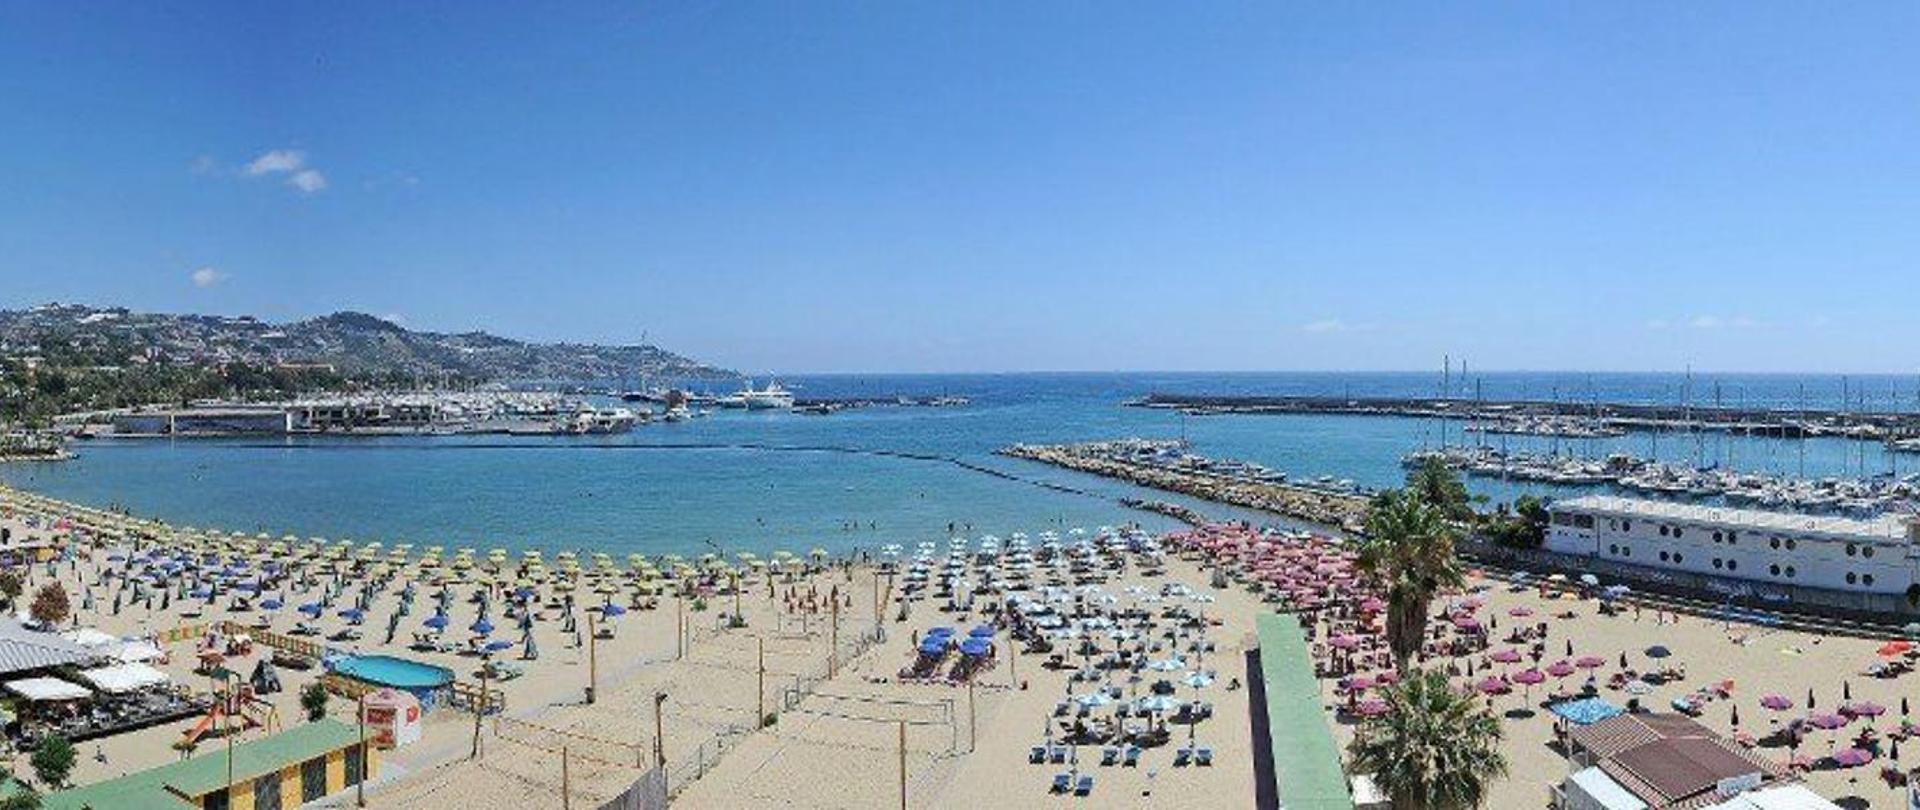 spiaggia-2.jpg